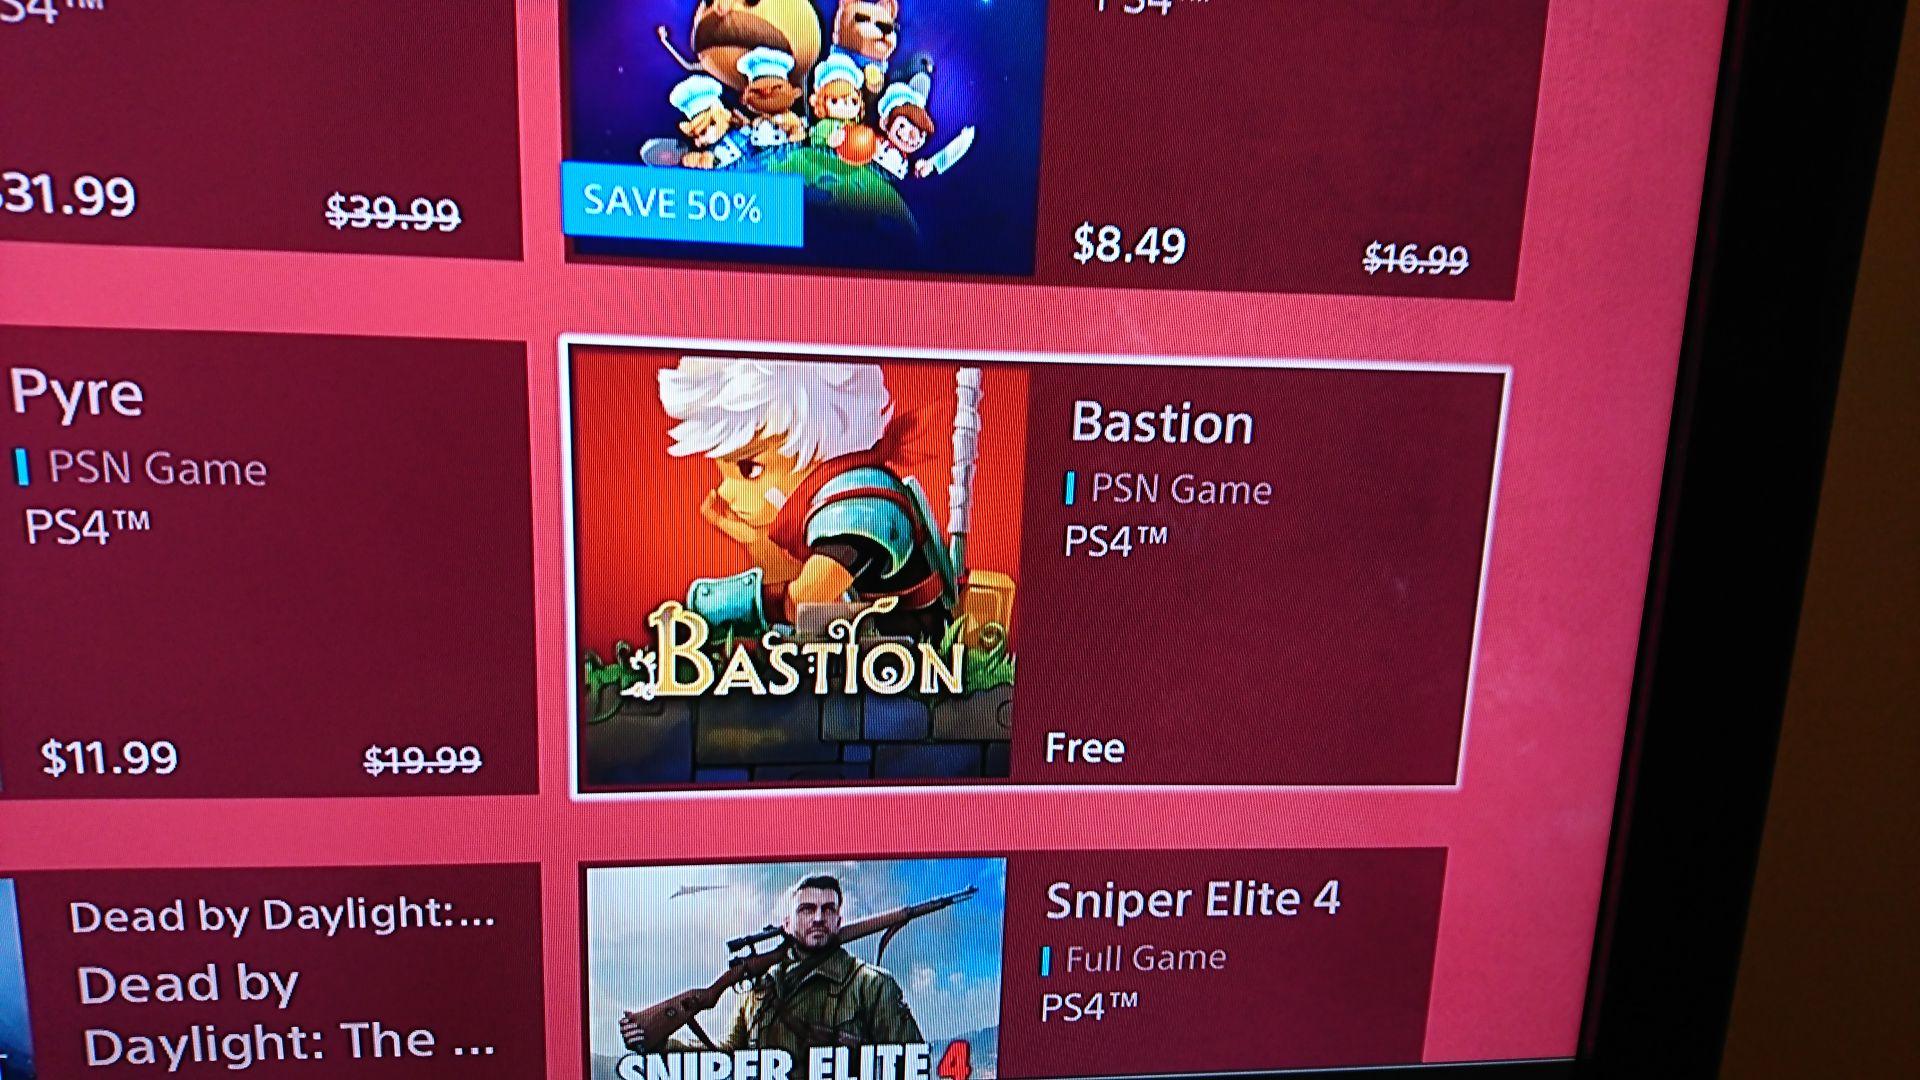 Bastion Free on PSN (US) *Possible Glitch*